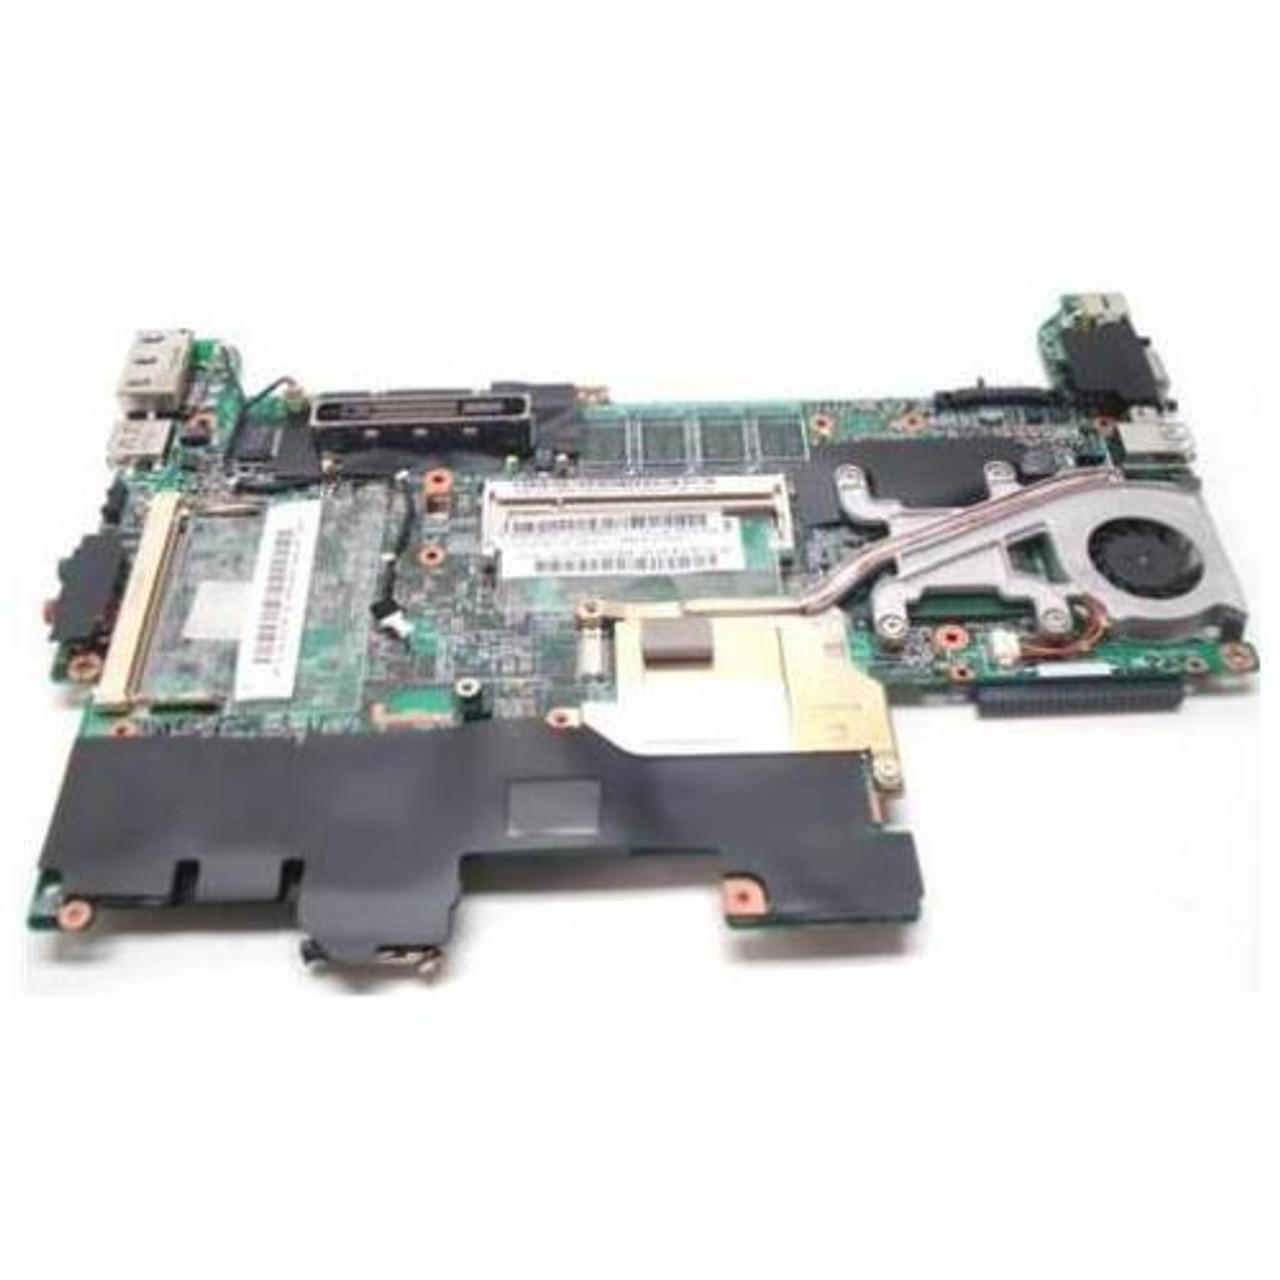 04X4982 Lenovo Planar AMD A6-7000 APU with Radeon R4 Graphics (Refurbished)